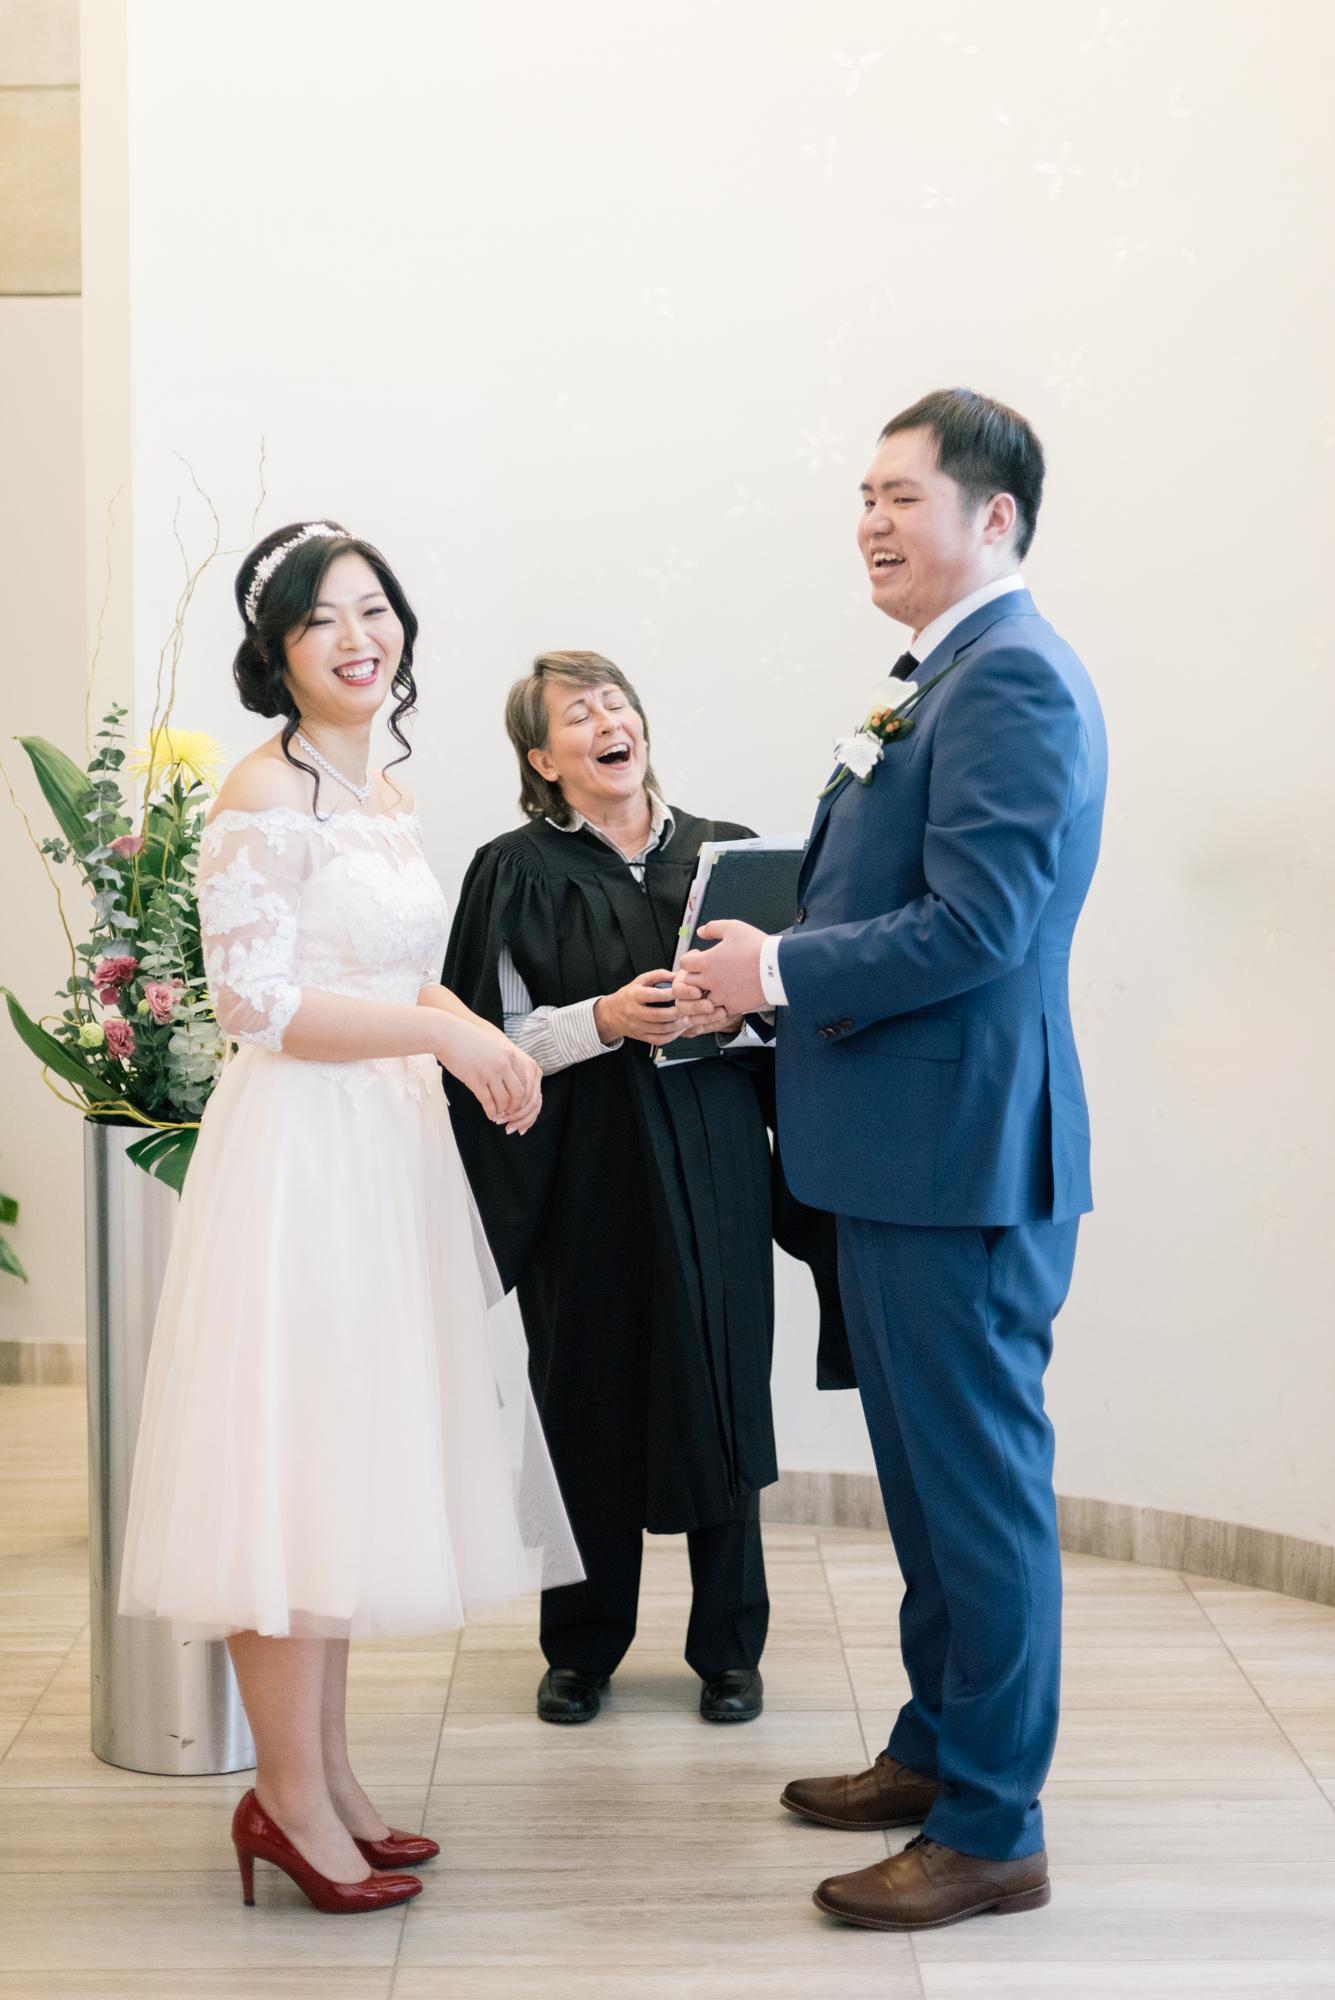 city-hall-wedding-11.jpg